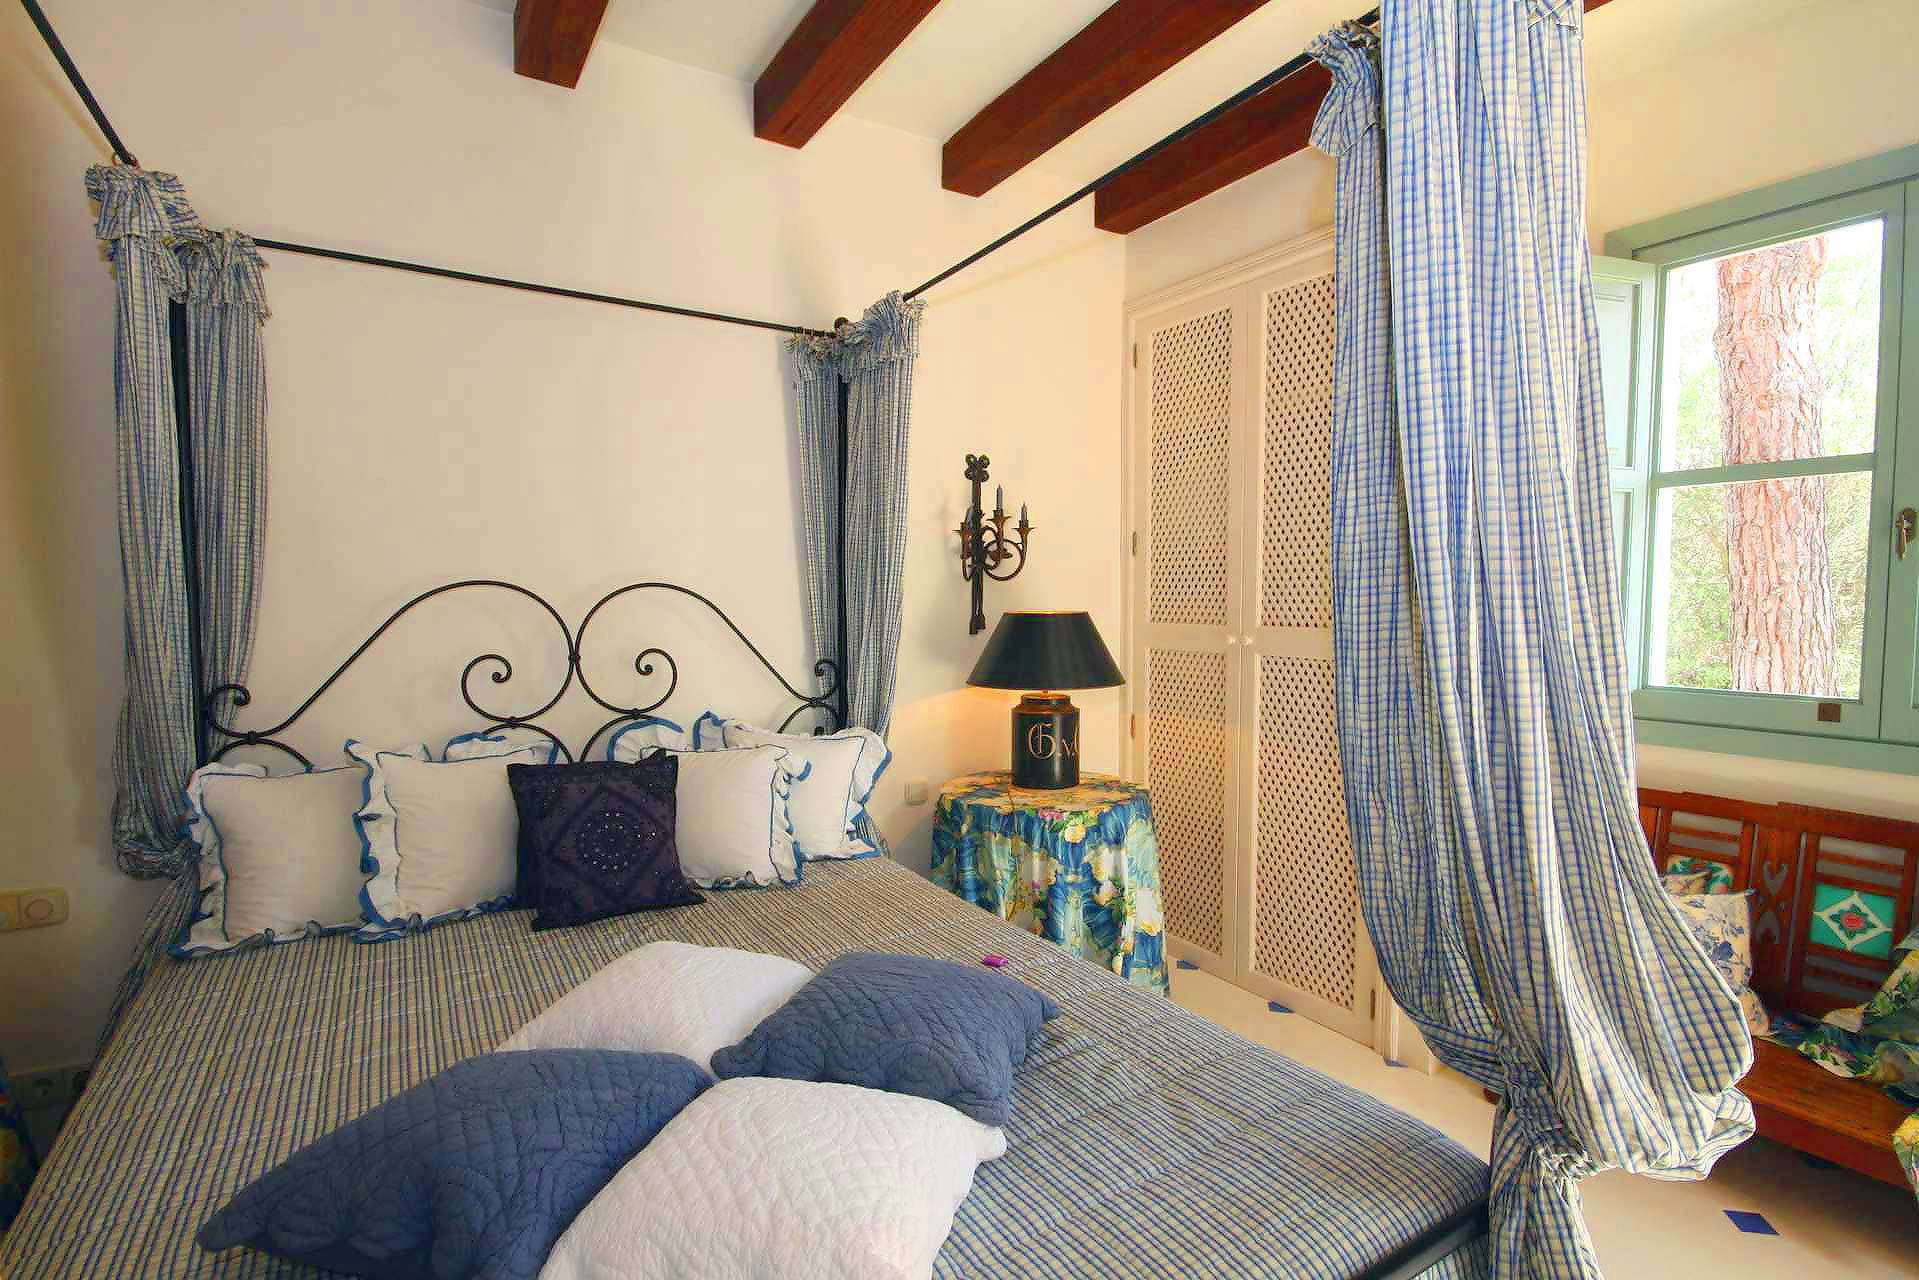 01-98 Extravagantes Ferienhaus Mallorca Osten Bild 27